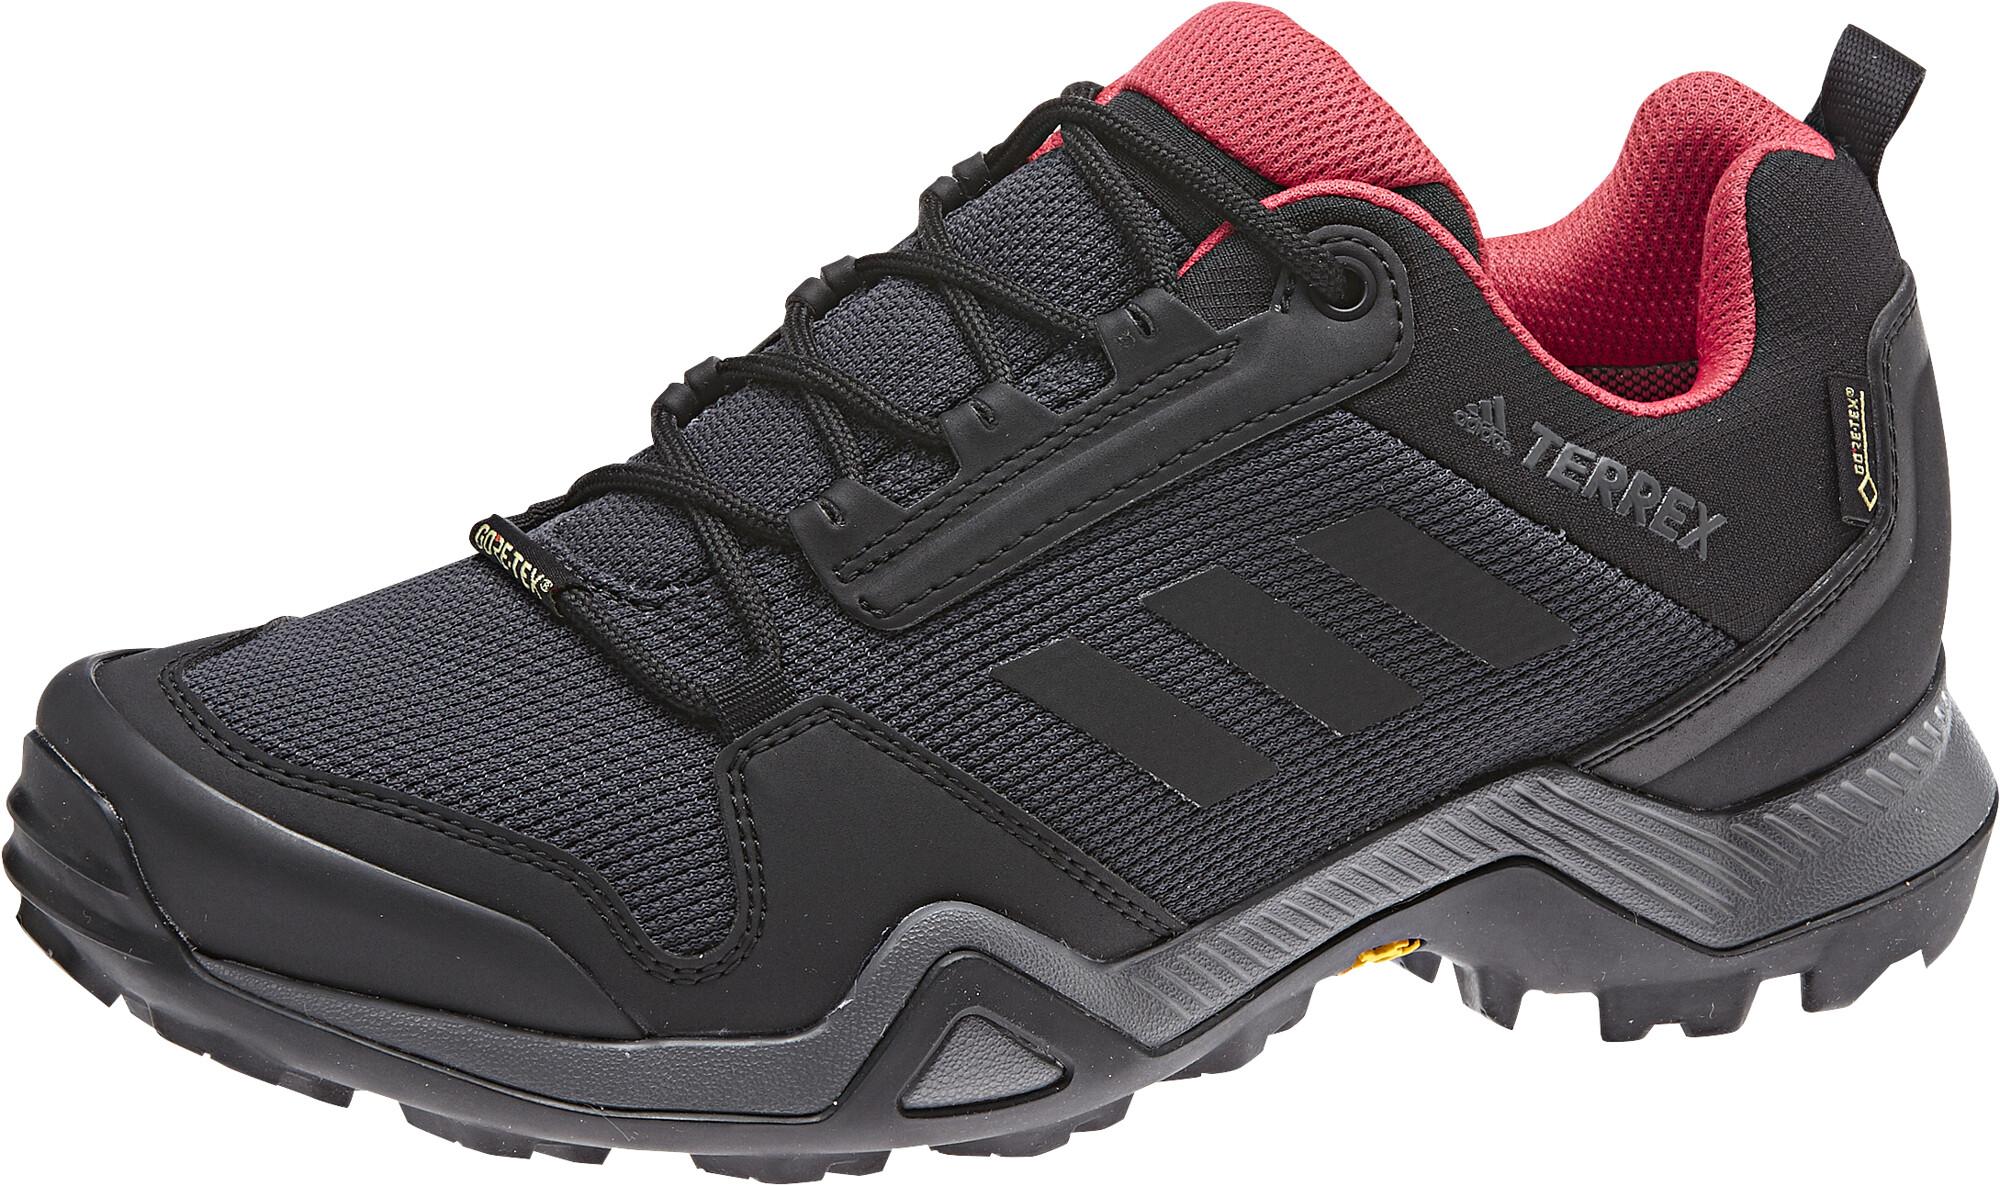 3a48c3bbcef adidas TERREX AX3 GTX Shoes Women grey black at Addnature.co.uk